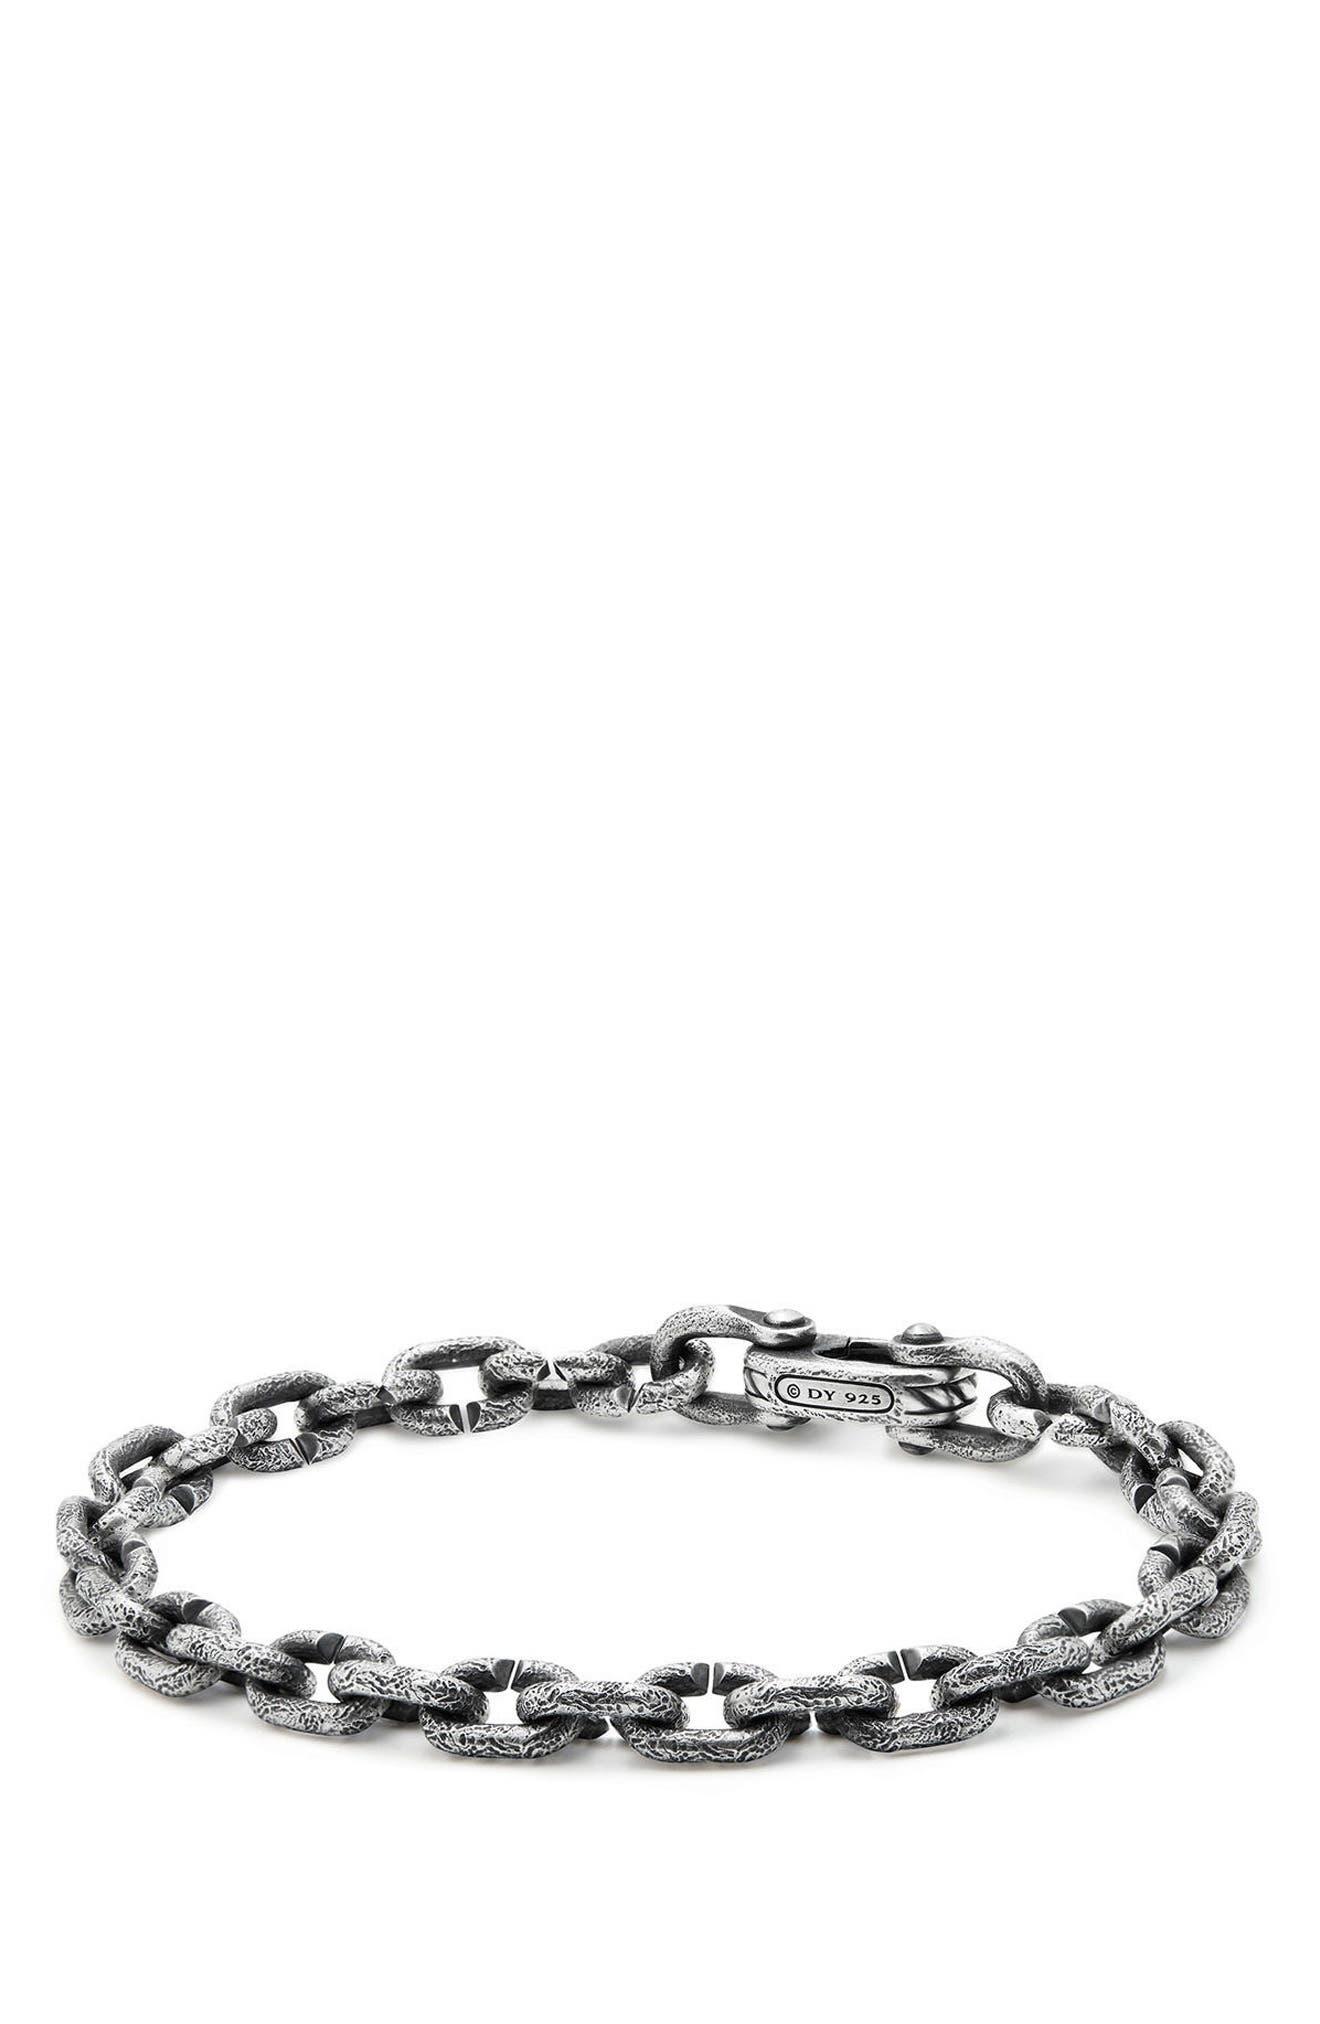 Shipwreck Chain Bracelet, 6mm,                             Main thumbnail 1, color,                             SILVER